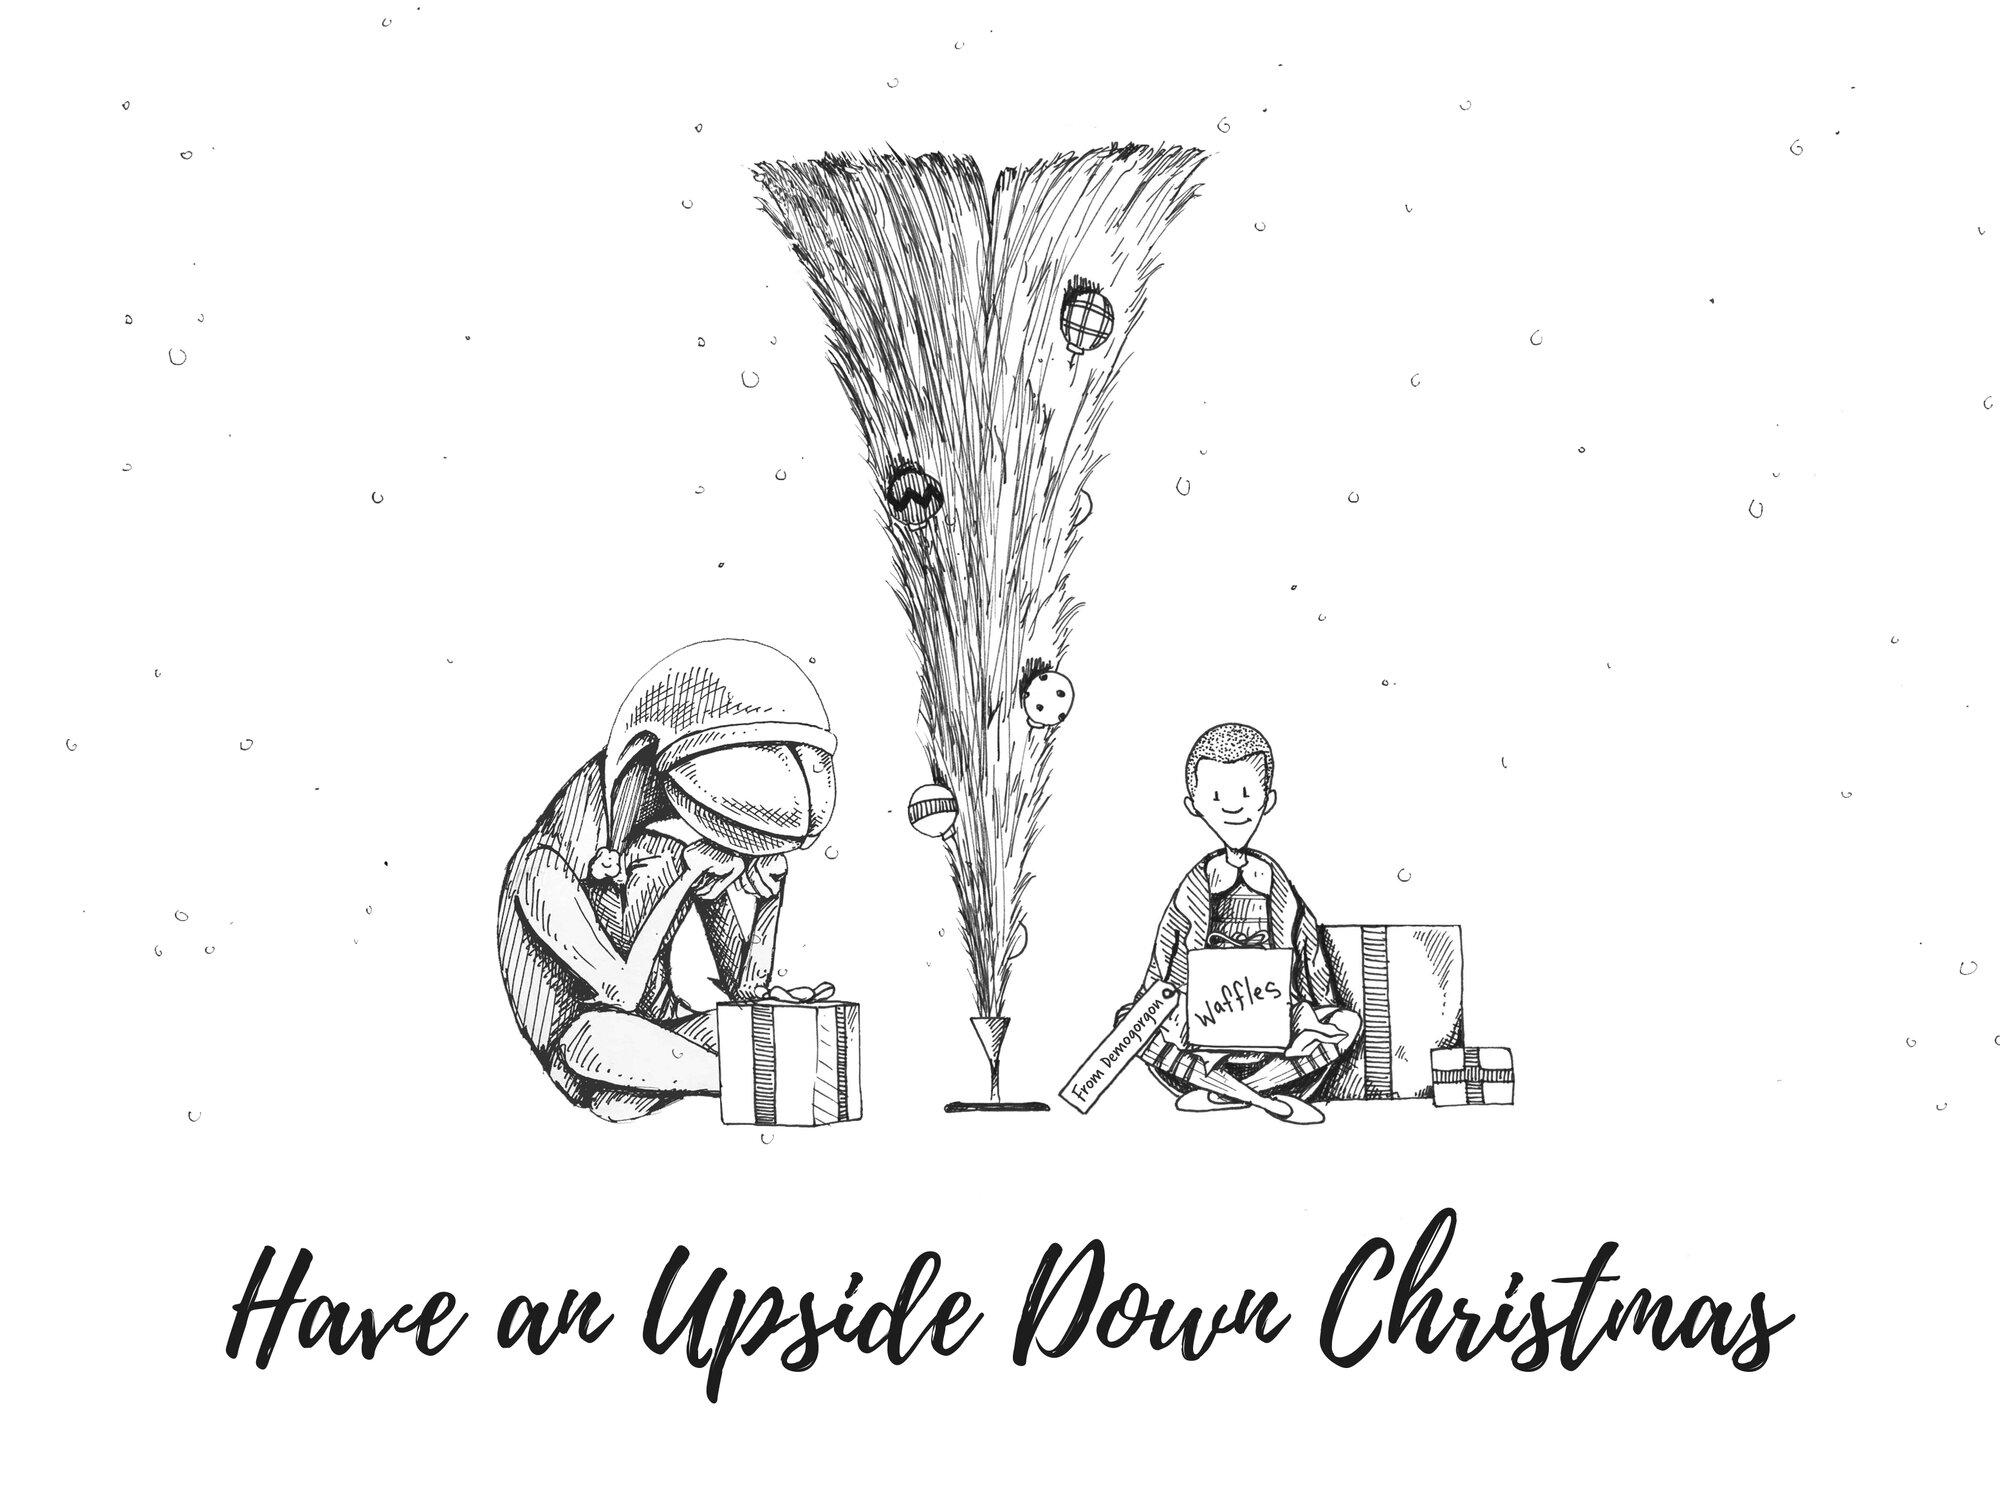 Strange Things Christmas Card